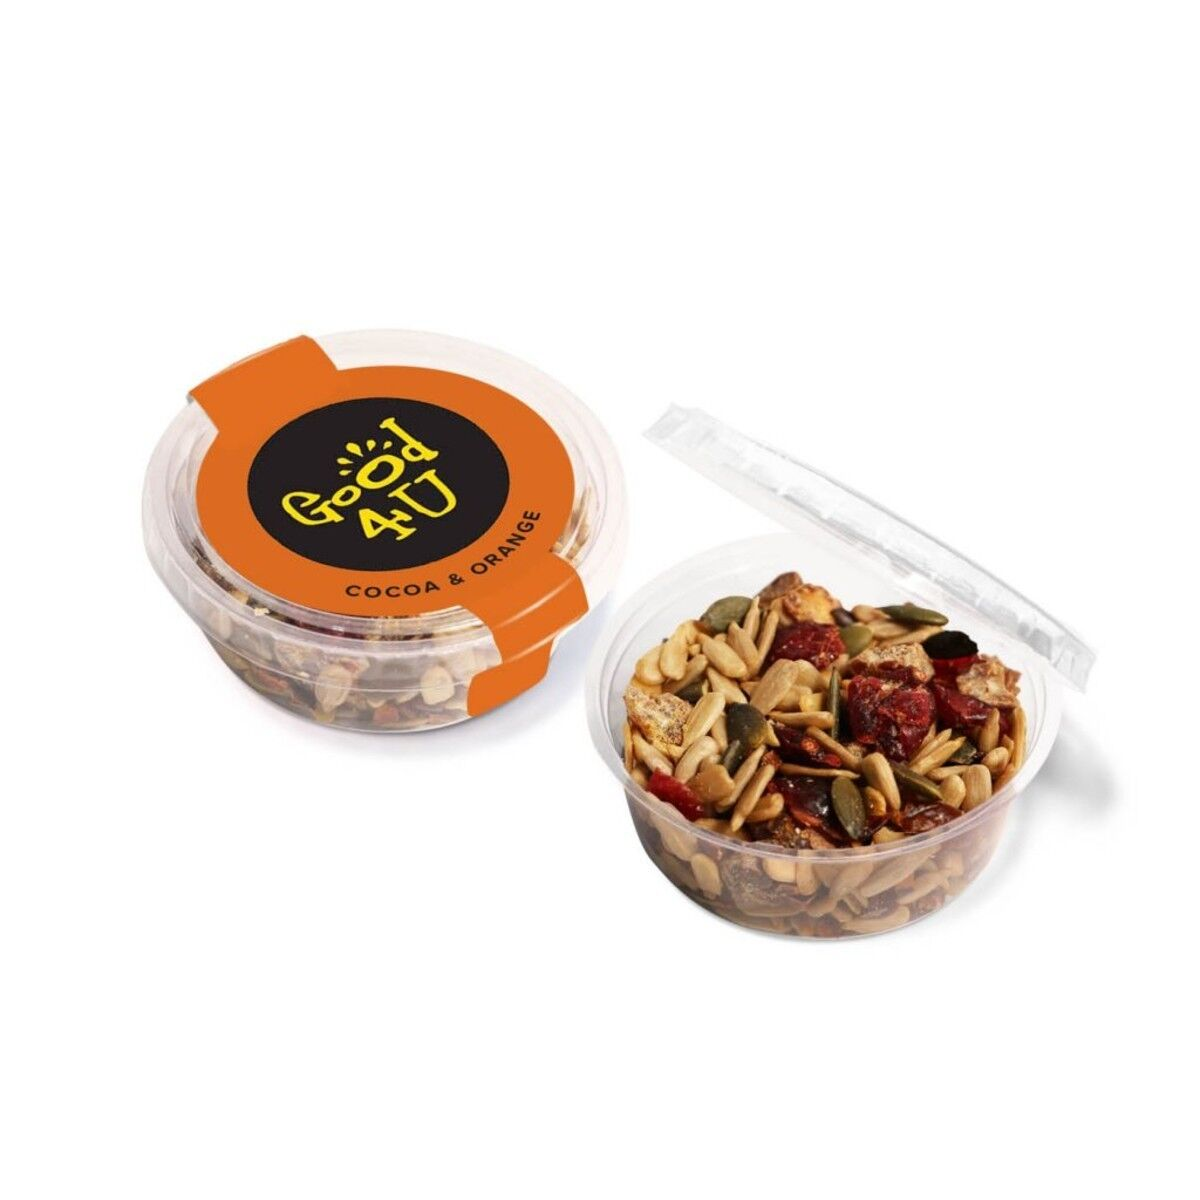 Midi Confectionery Pot filled with Cocoa & Orange Snacks